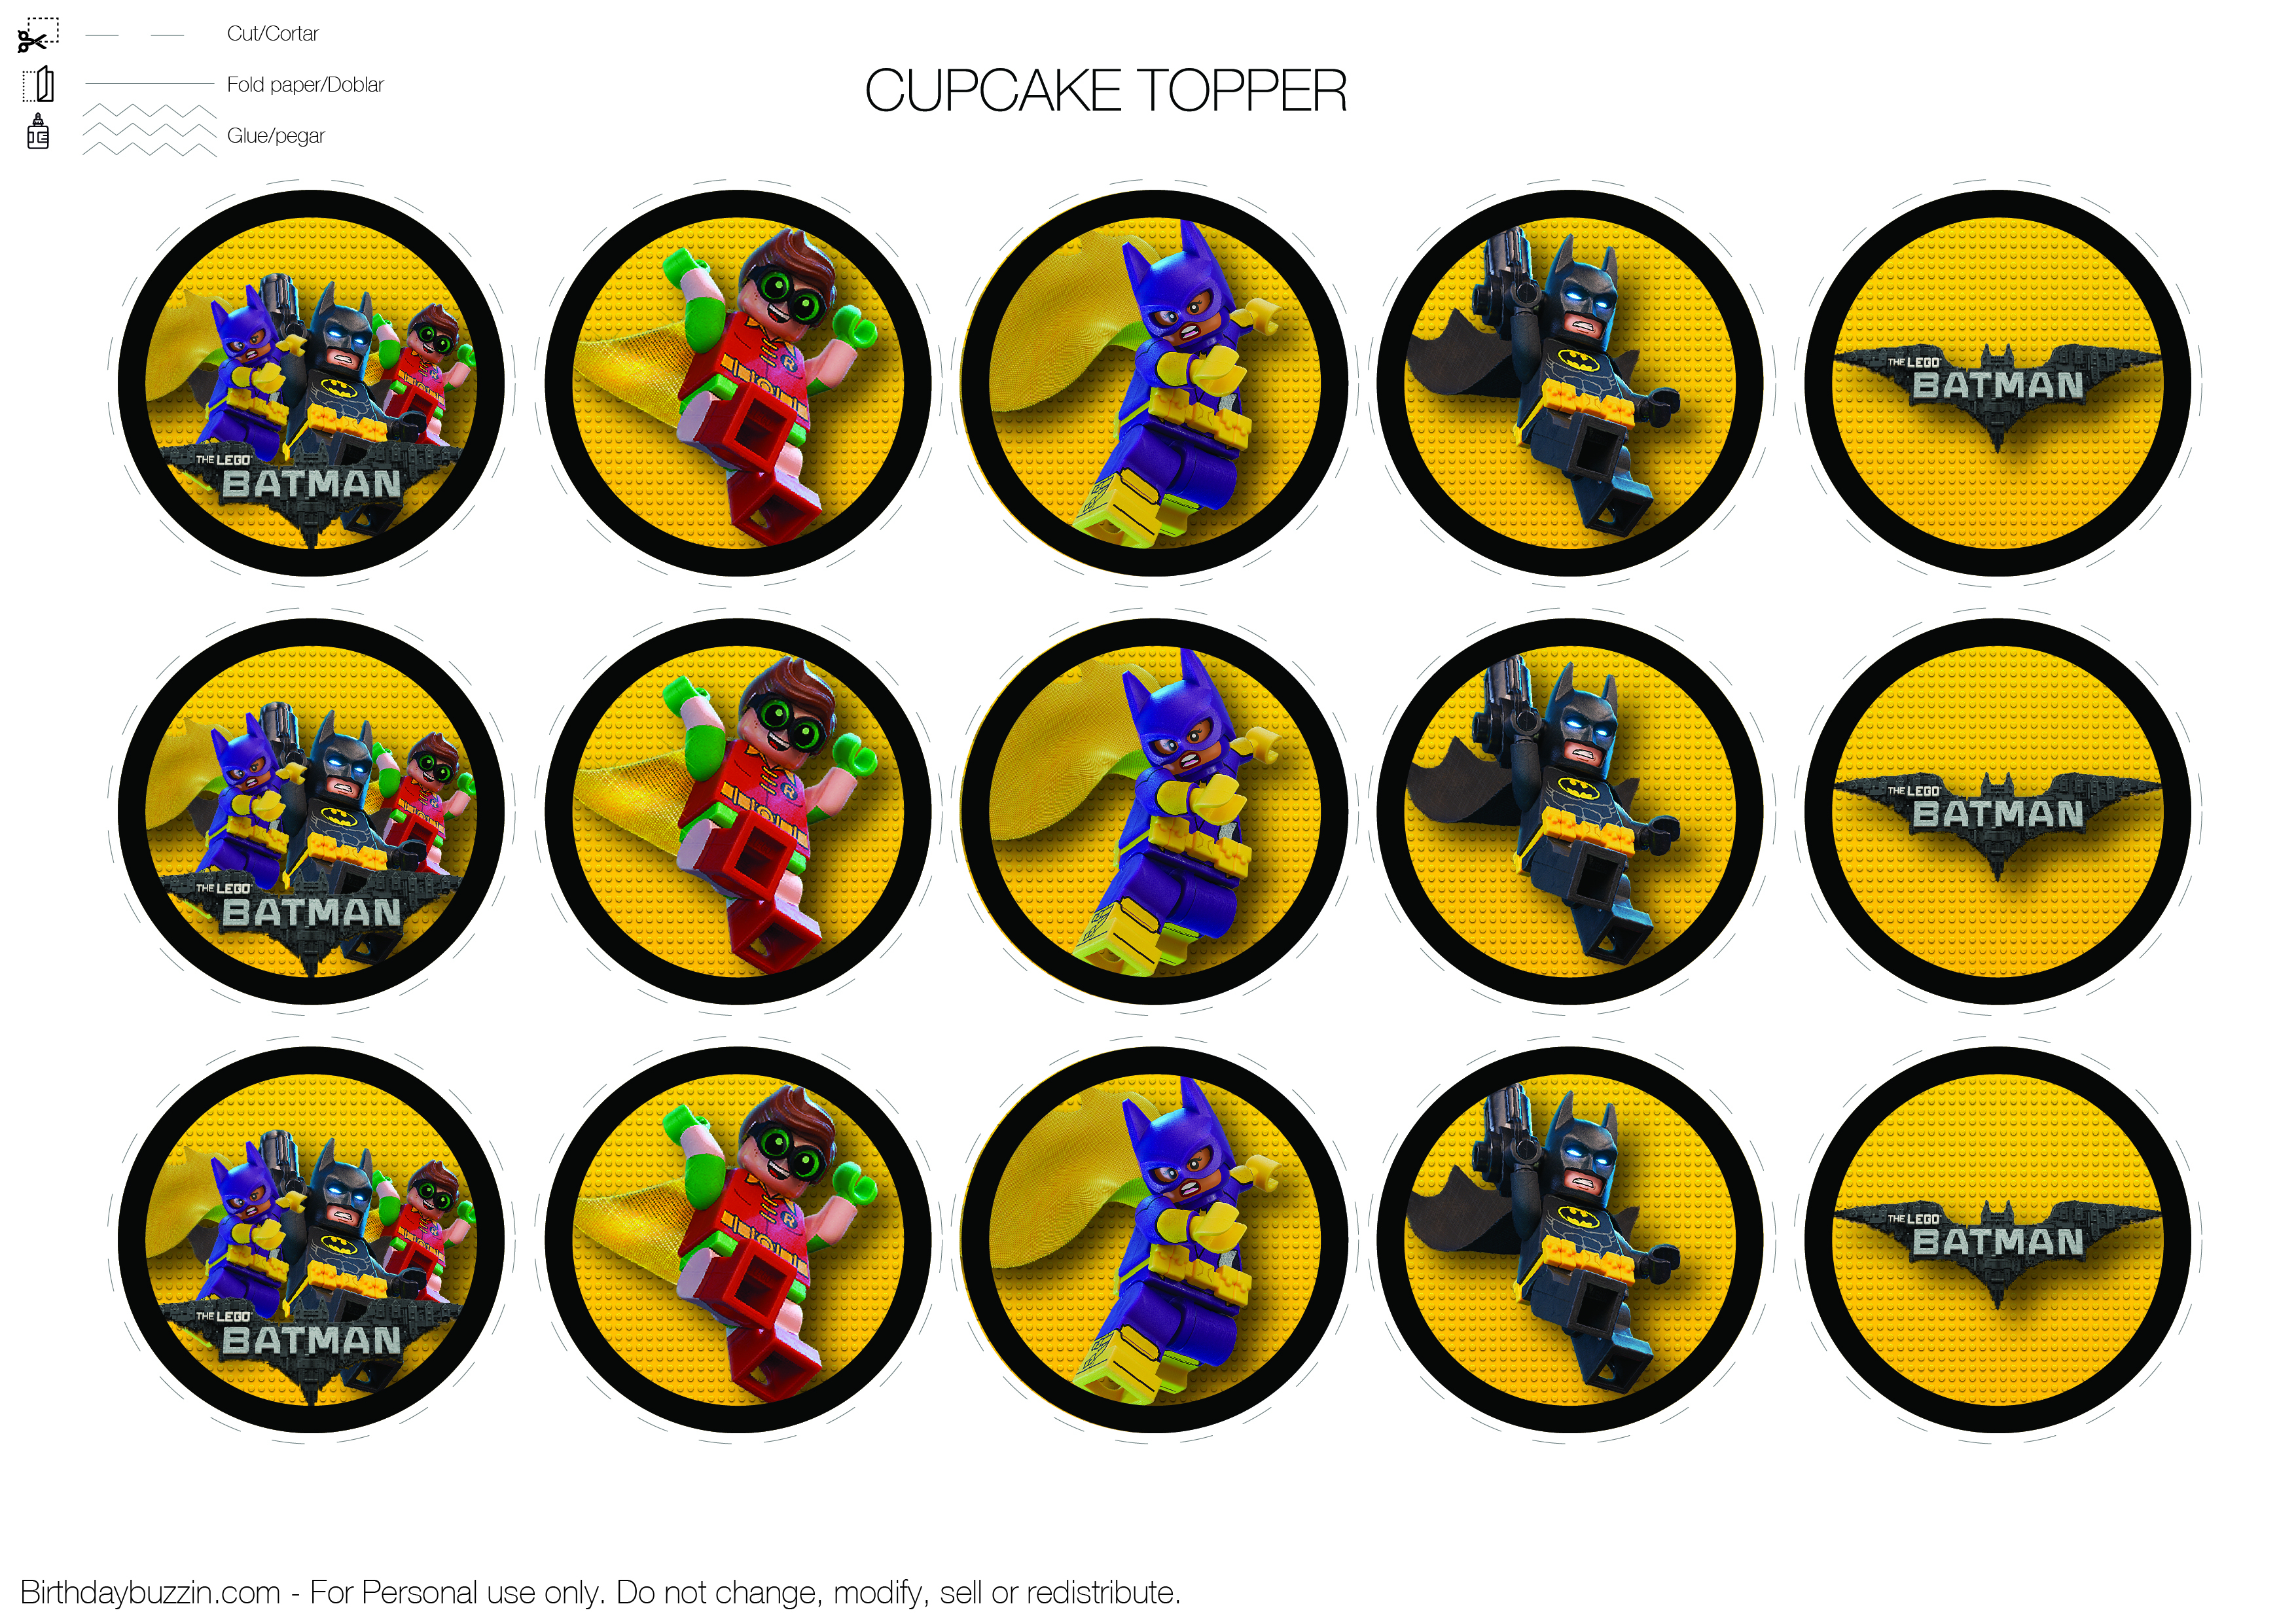 Lego-Batman-Cupcake-Topper   Birthday Buzzin - Free Printable Lego Batman